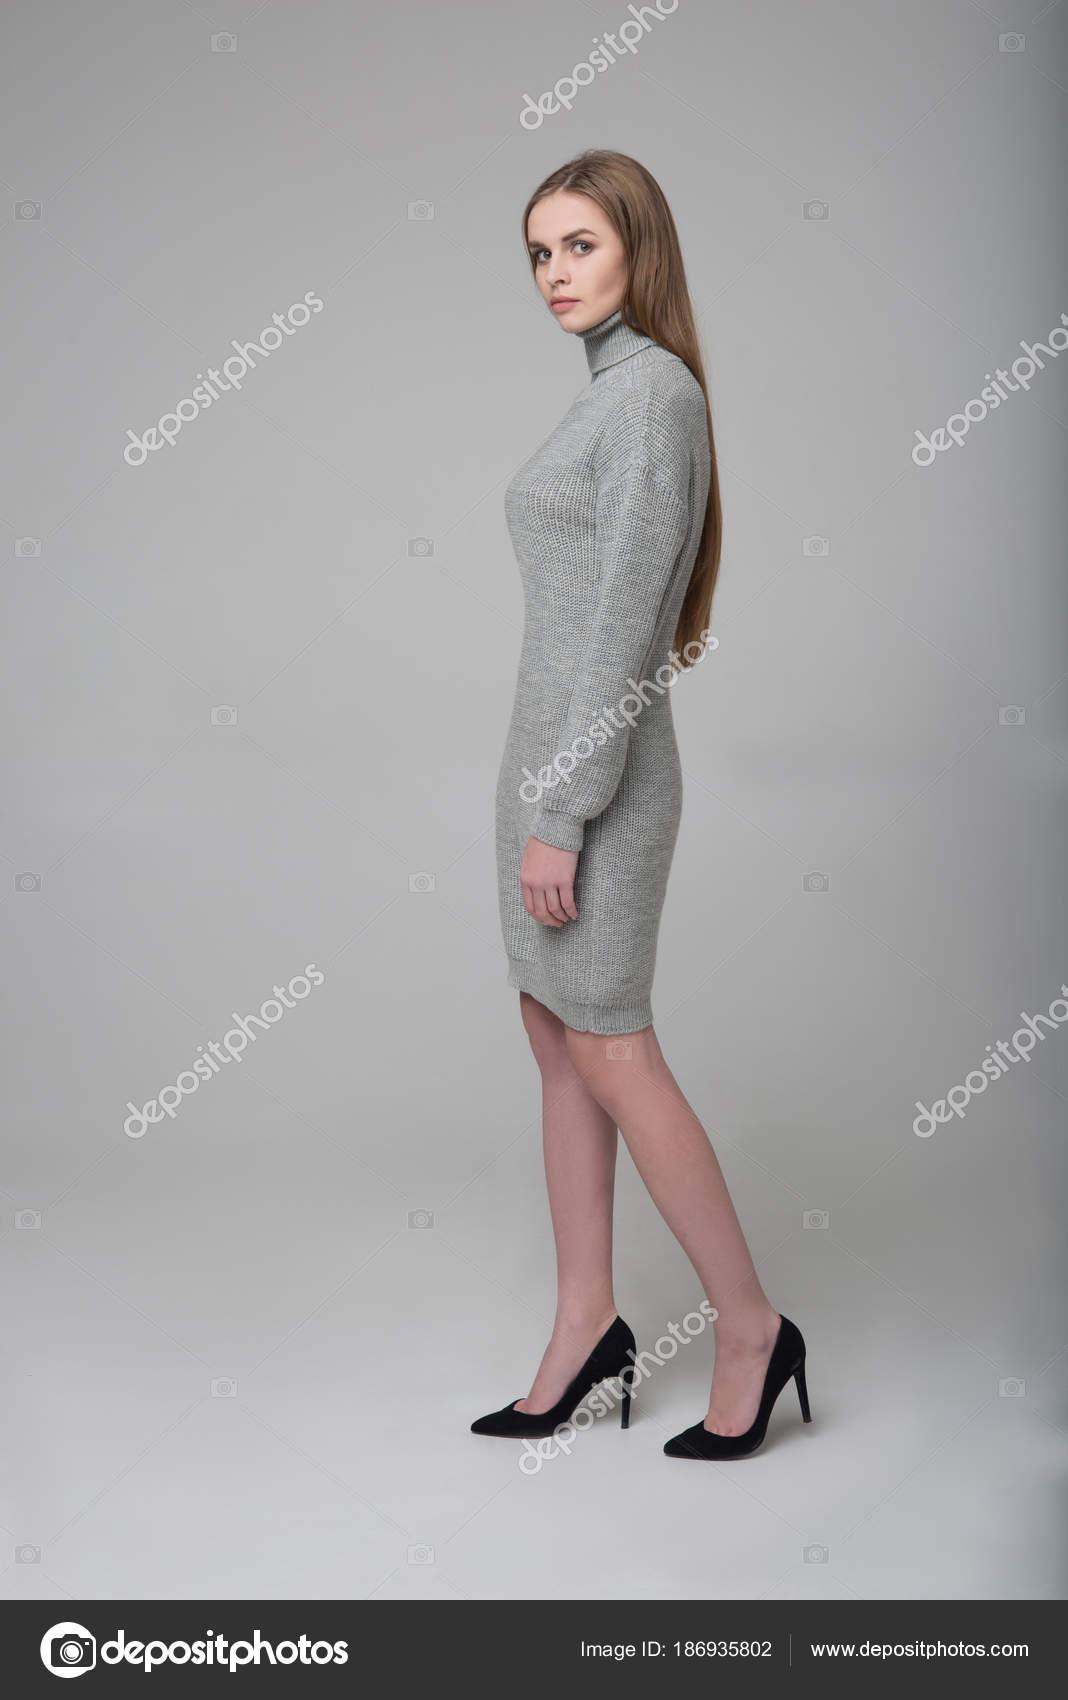 Joven Modelo Hembra Pelo Largo Hermosa Vestido Punto Gris — Foto de ...